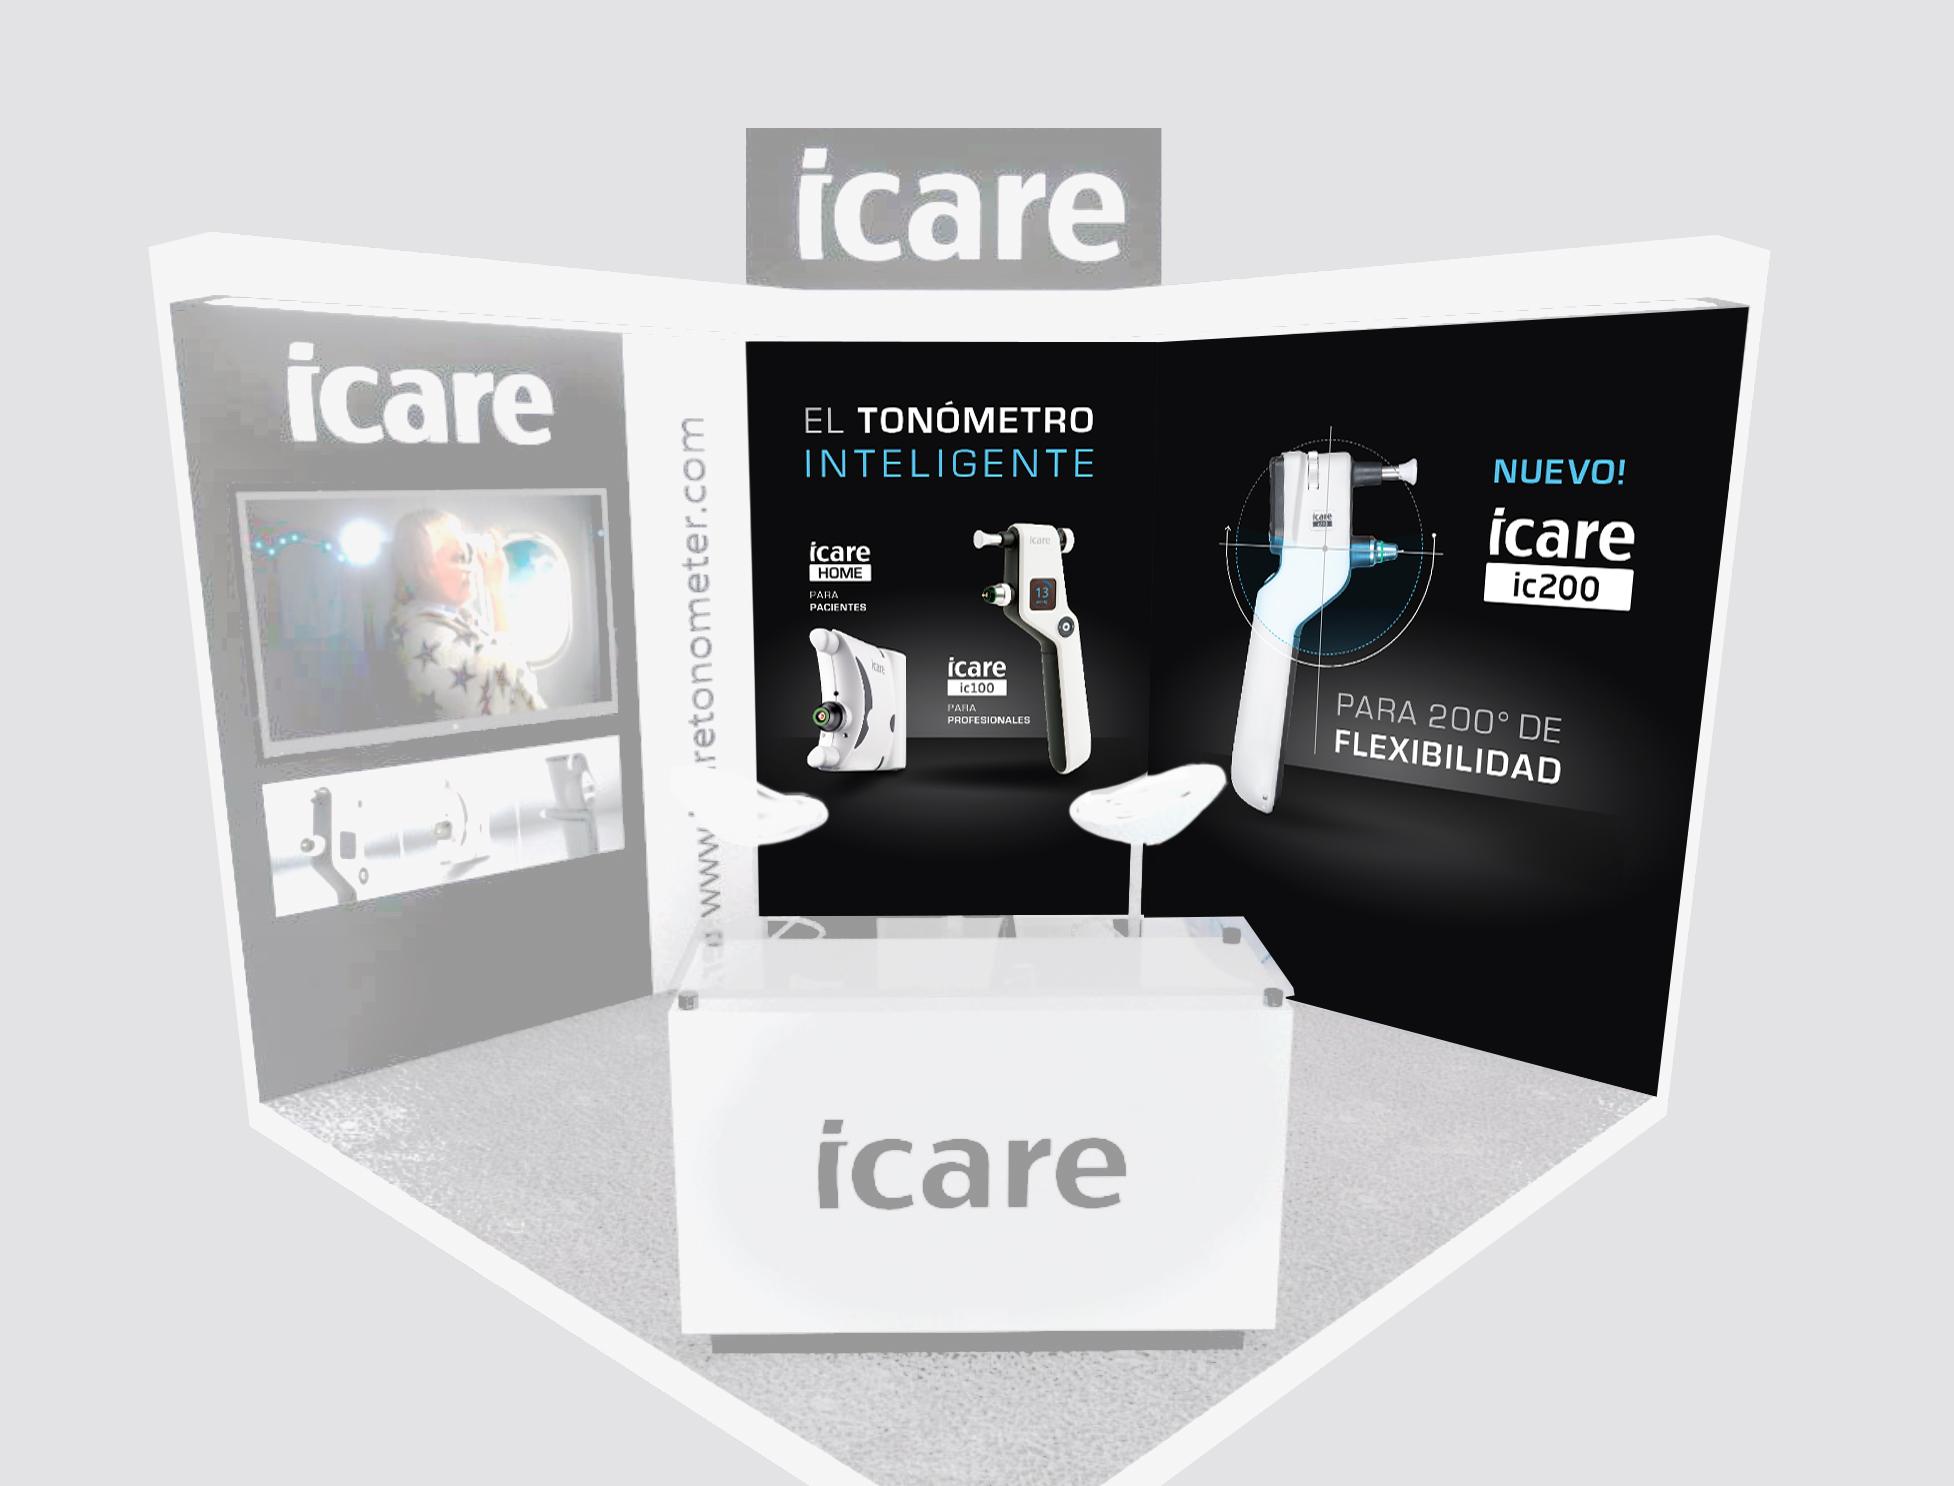 Work_Icare_ic200_SAtradeshow